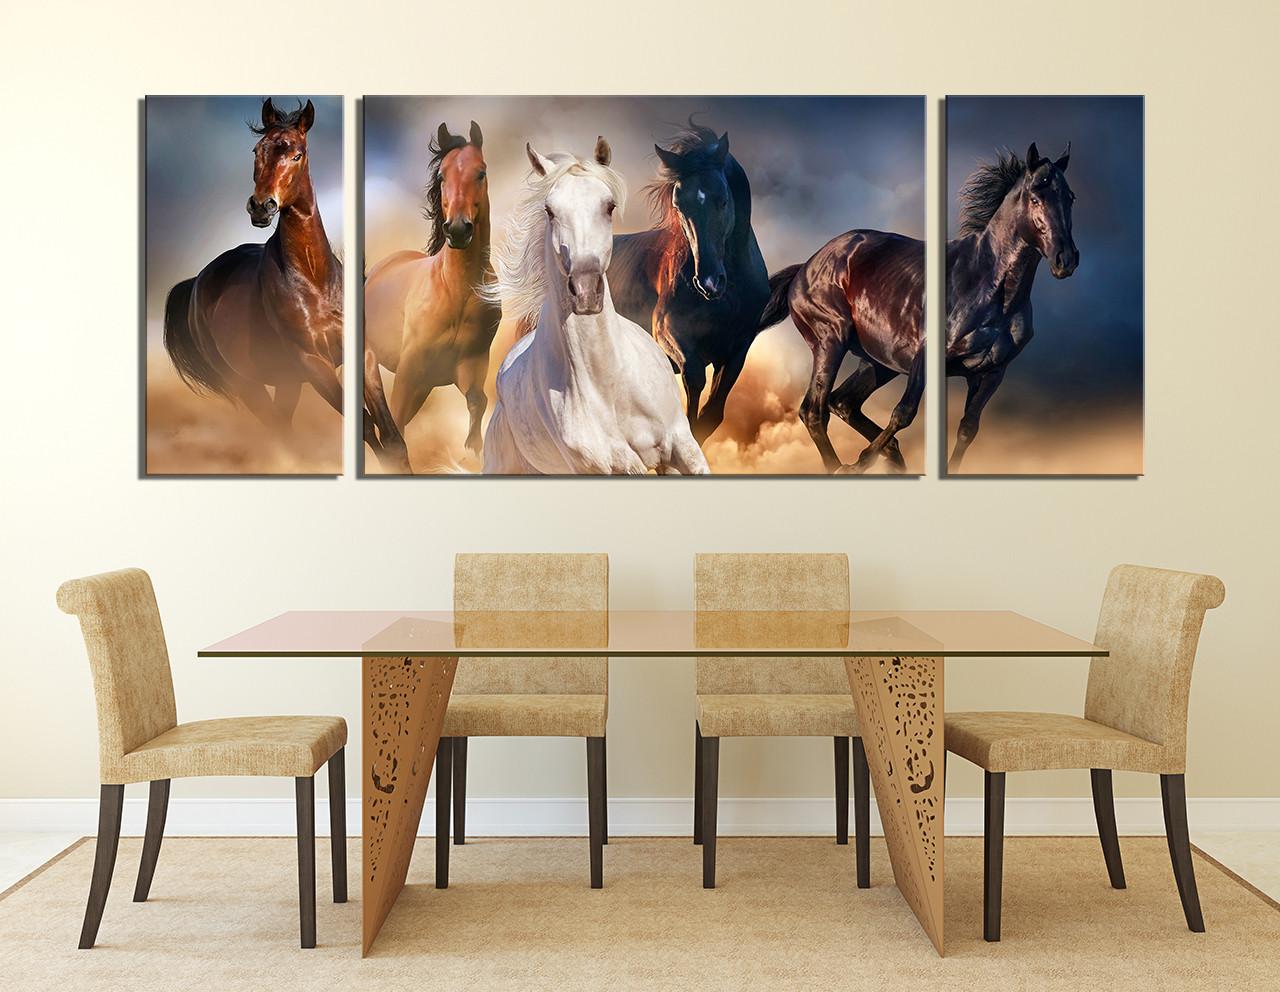 Wall Art Horses 3 piece canvas wall art, horses wall decor, panoramic canvas